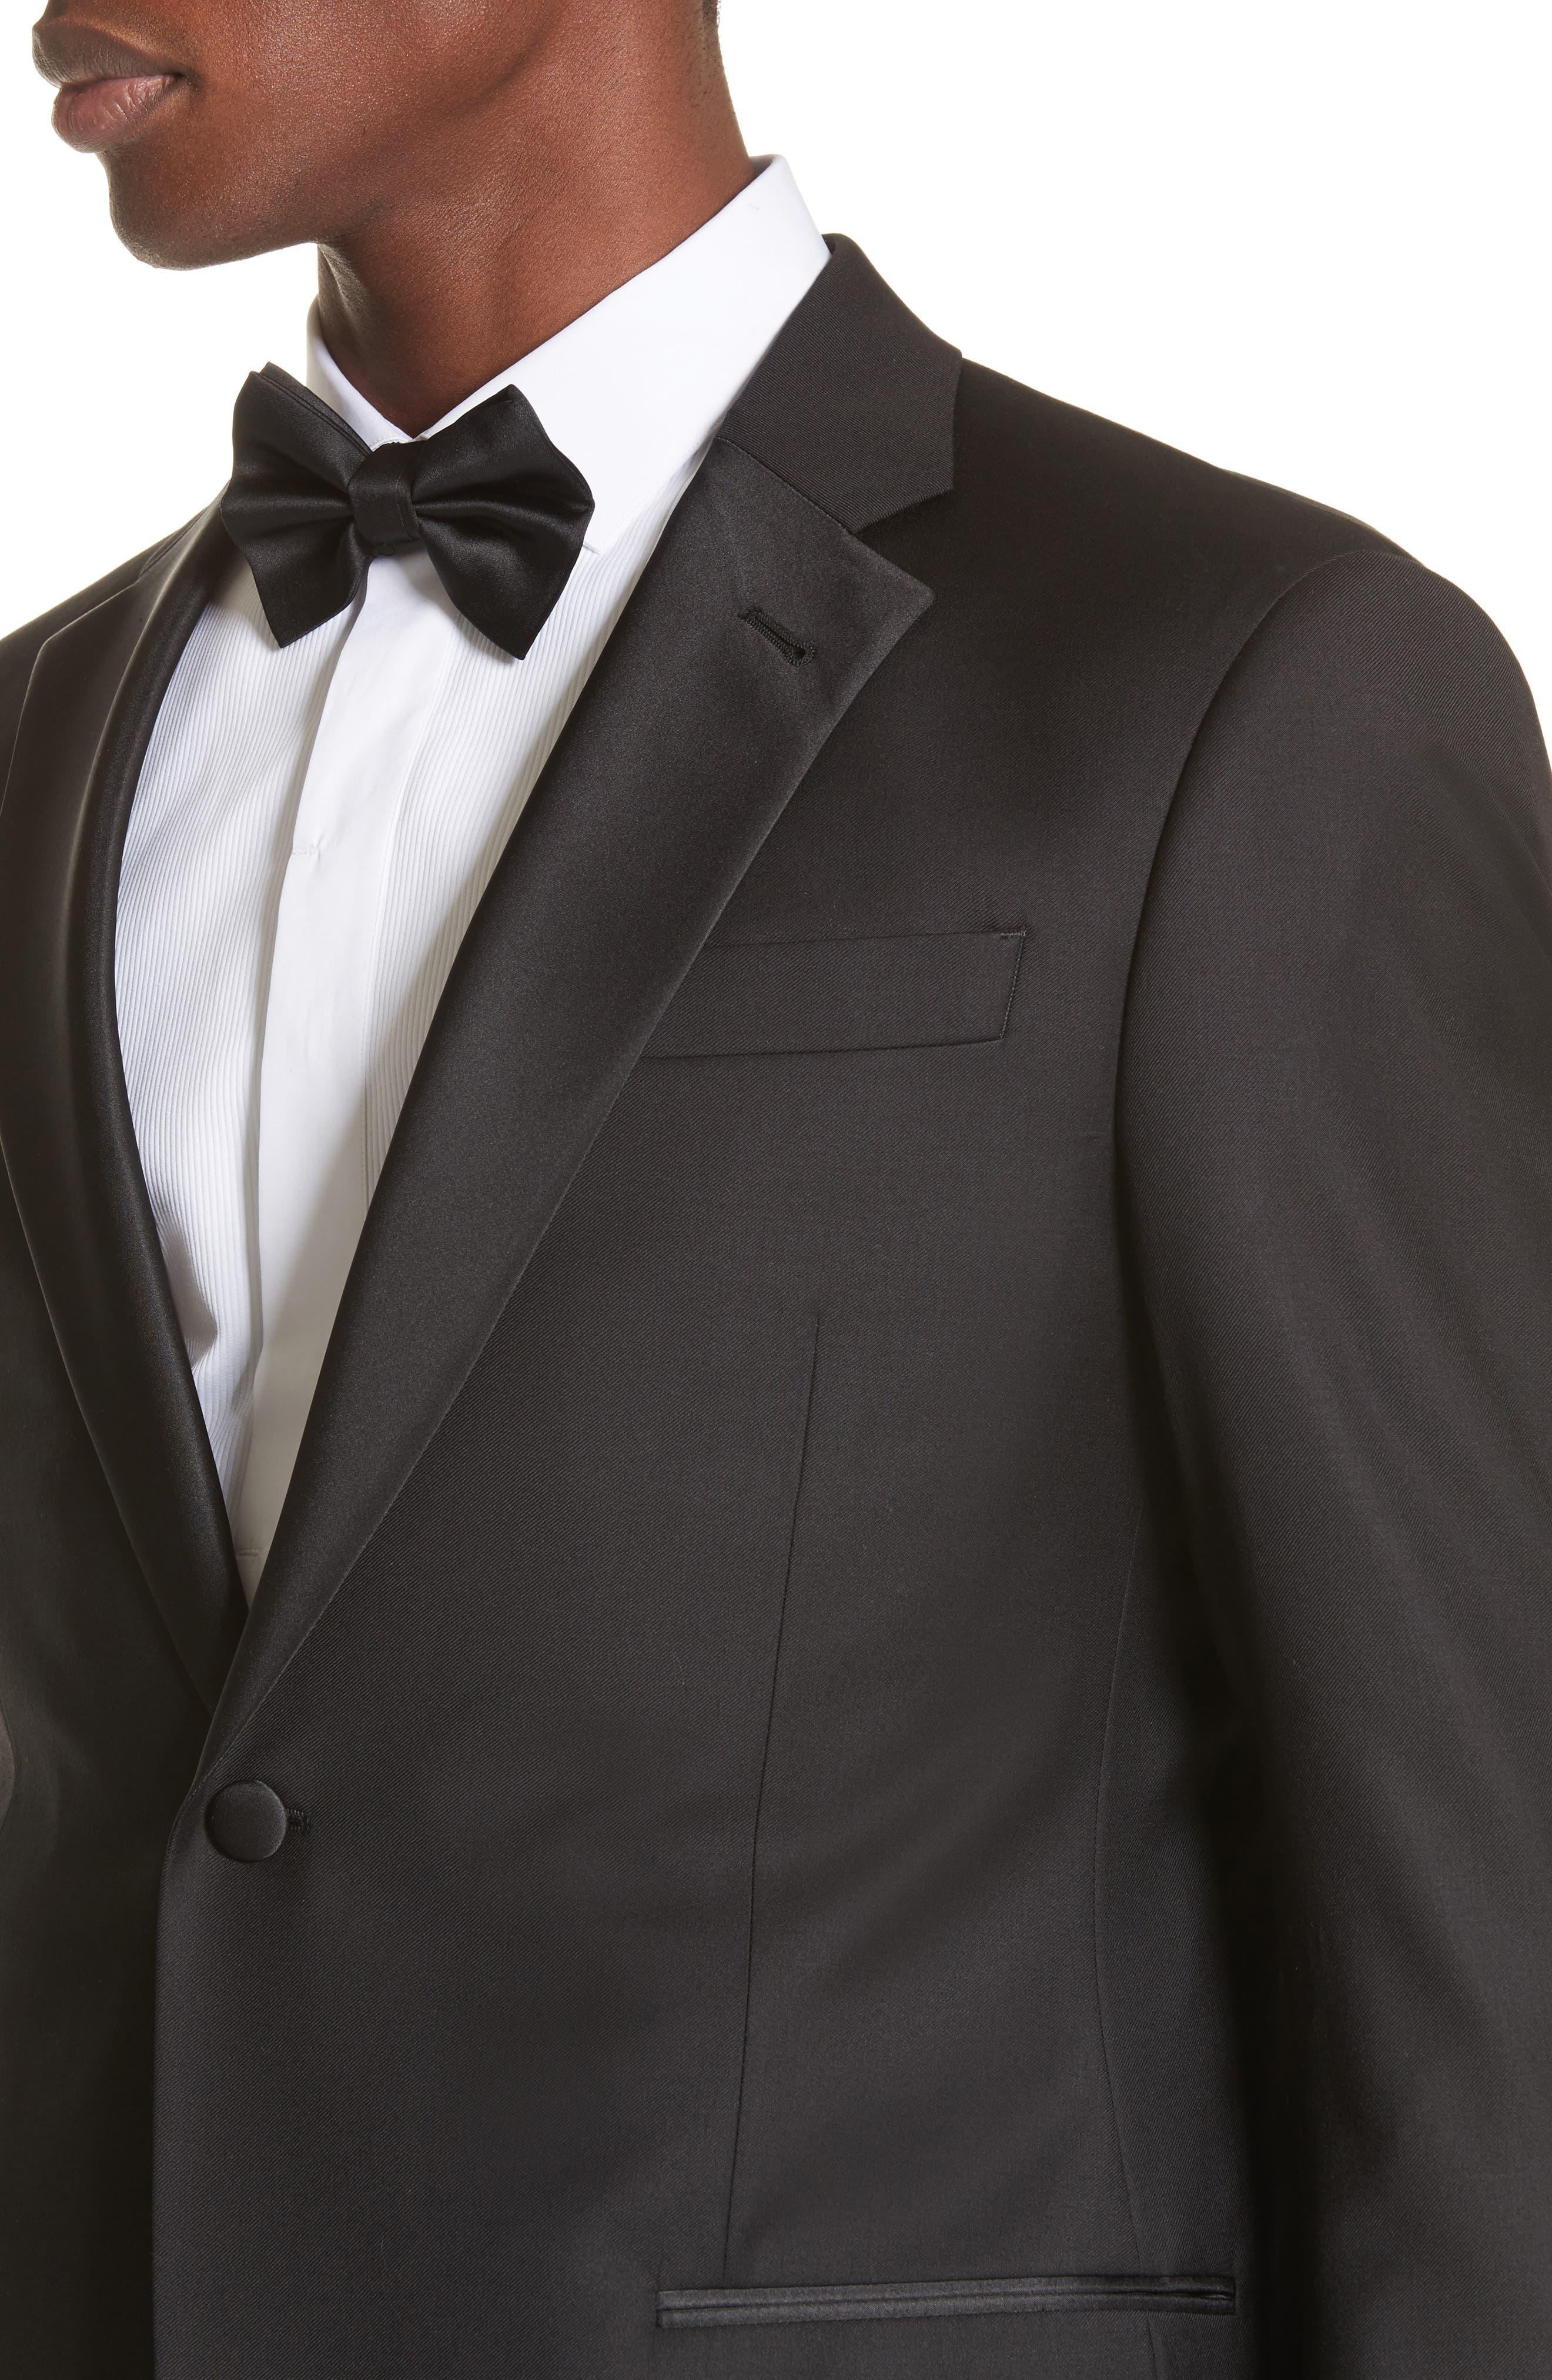 EMPORIO ARMANI, Trim Fit Wool Tuxedo, Alternate thumbnail 4, color, BLACK